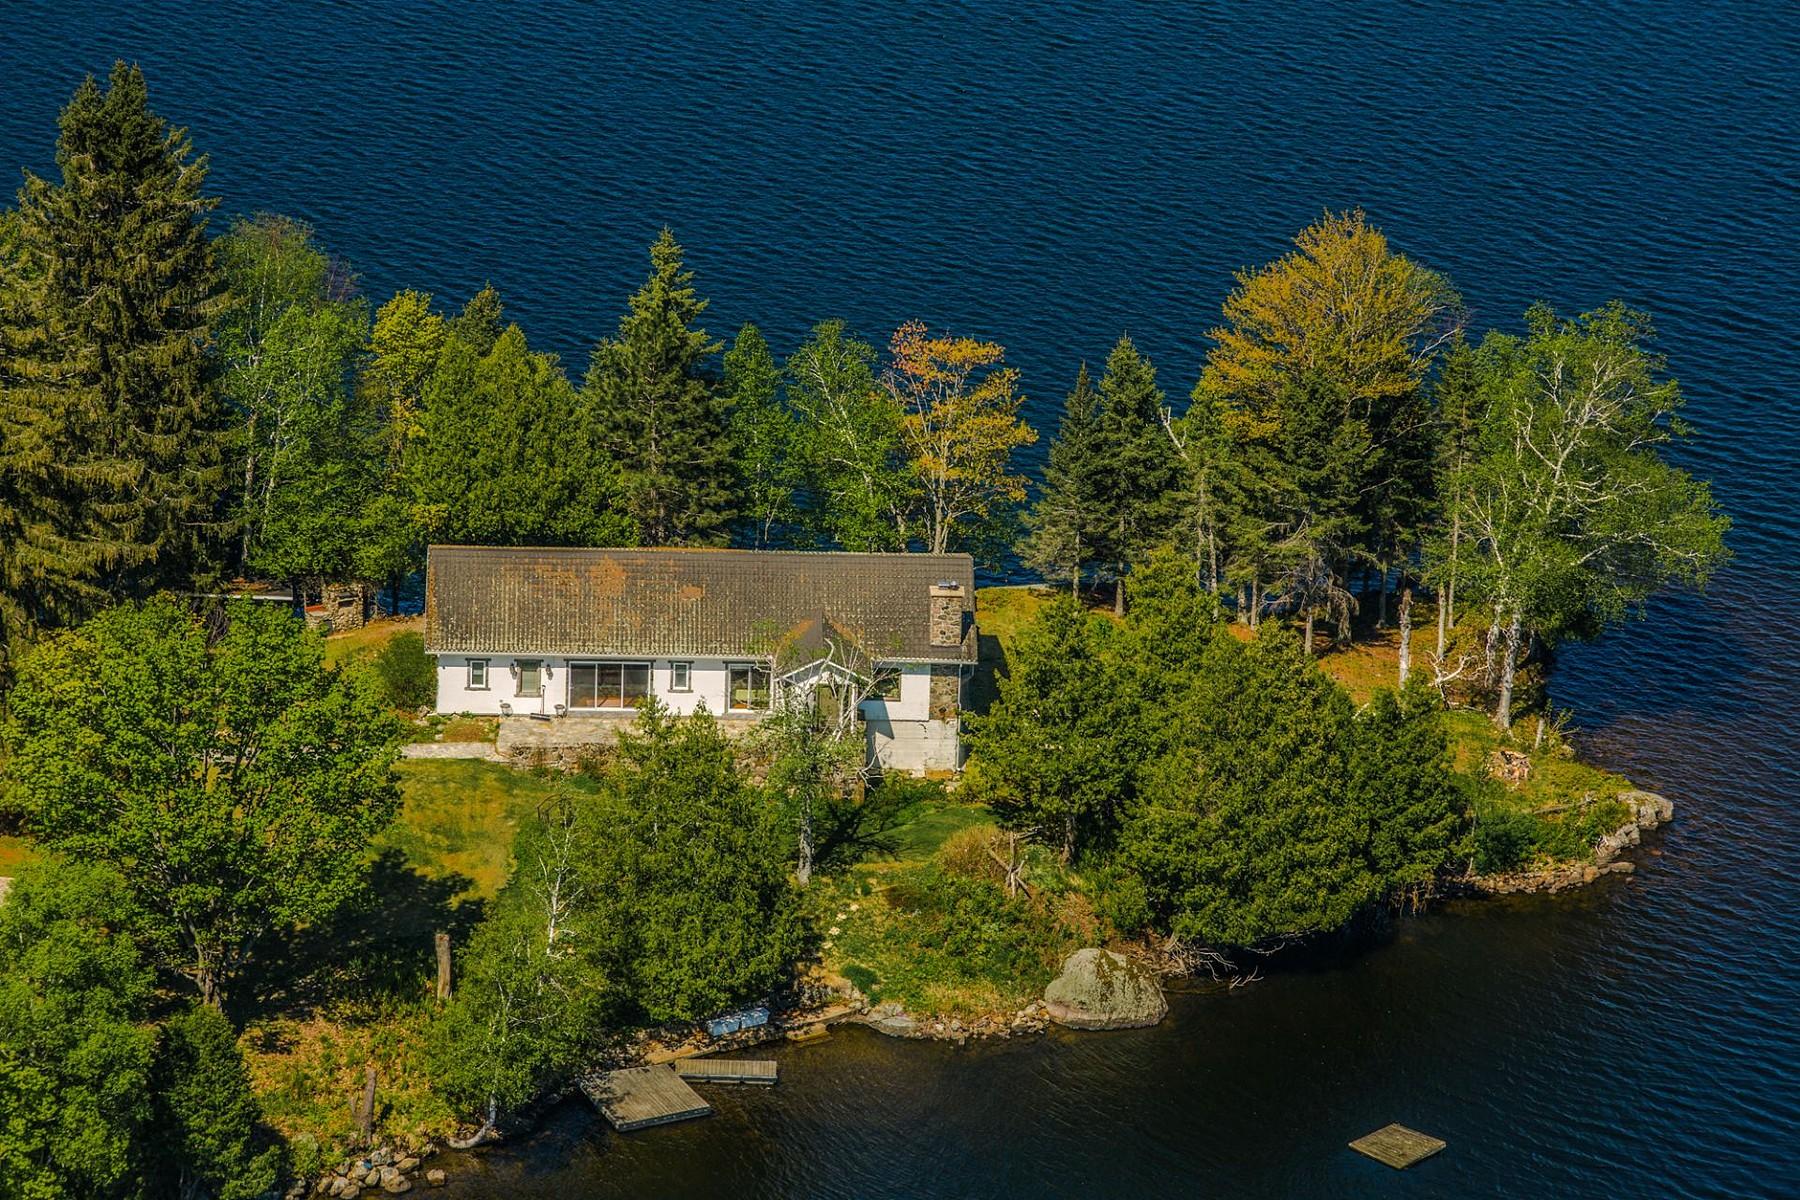 独户住宅 为 销售 在 Mont-Tremblant, Laurentides 134 Ch. Dorken 塔伯拉, 魁北克省 J8E1Y2 加拿大